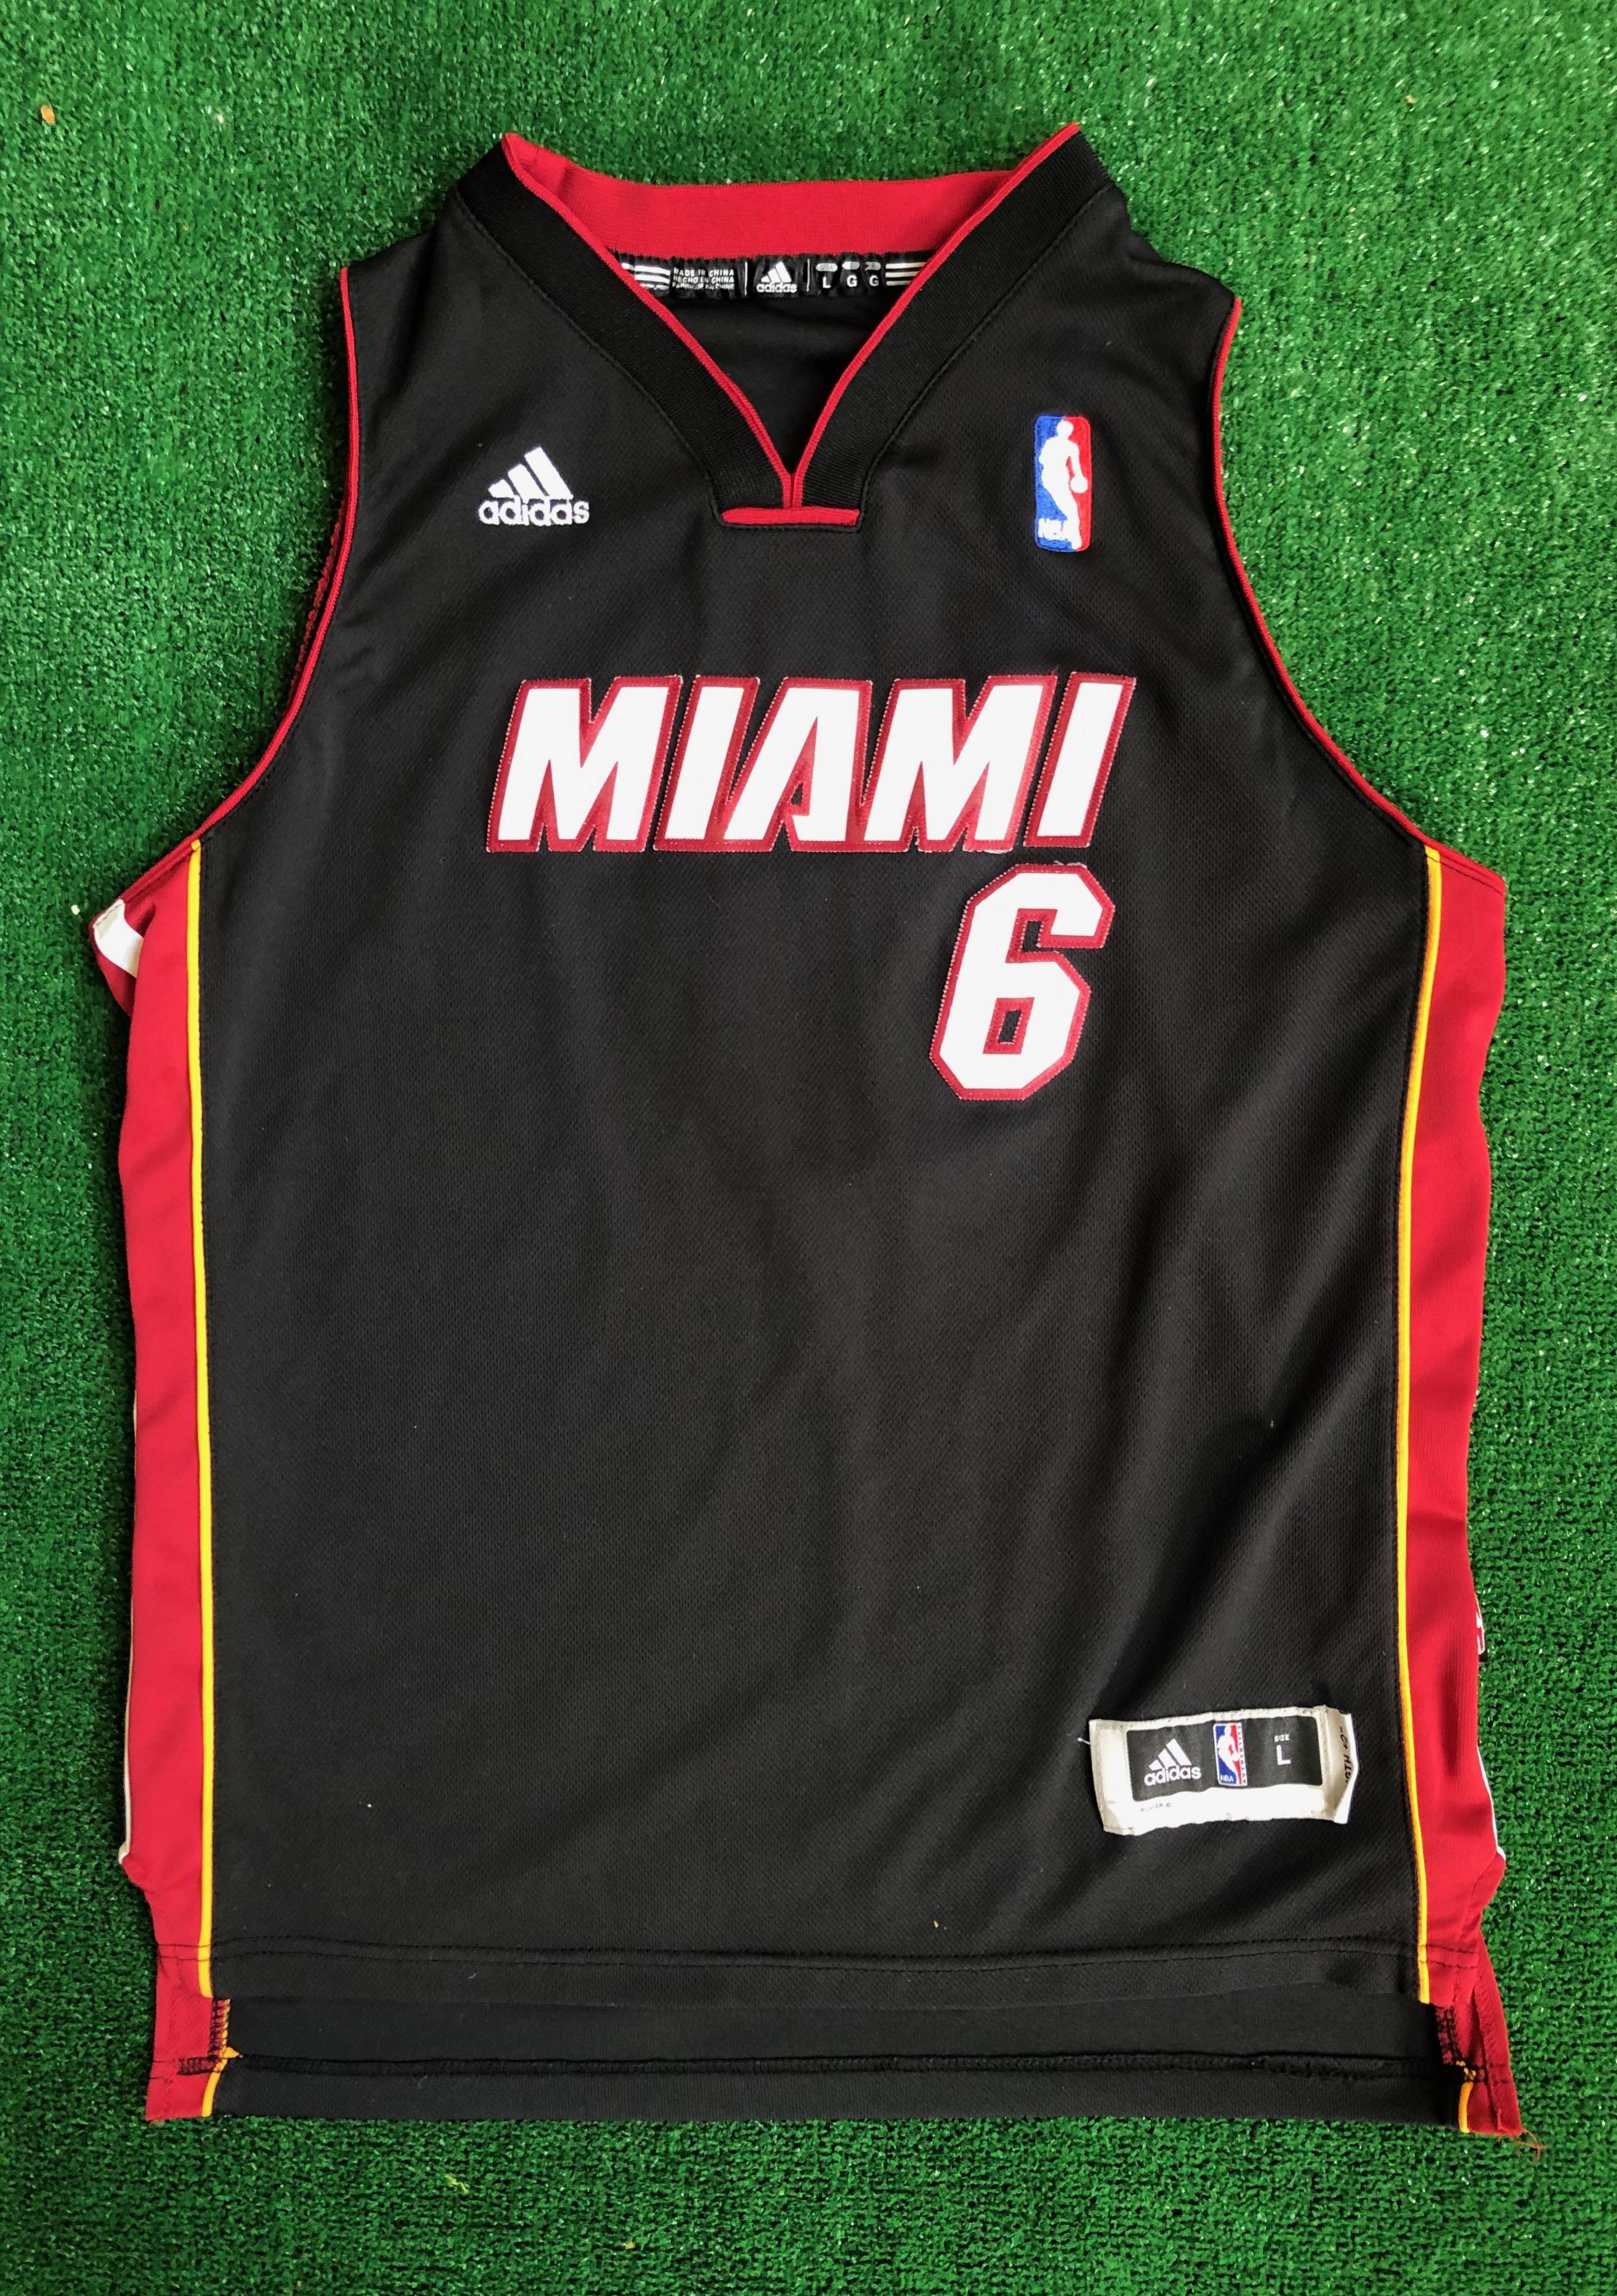 2010 LeBron James Miami Heat Adidas Swingman NBA Jersey Youth Large